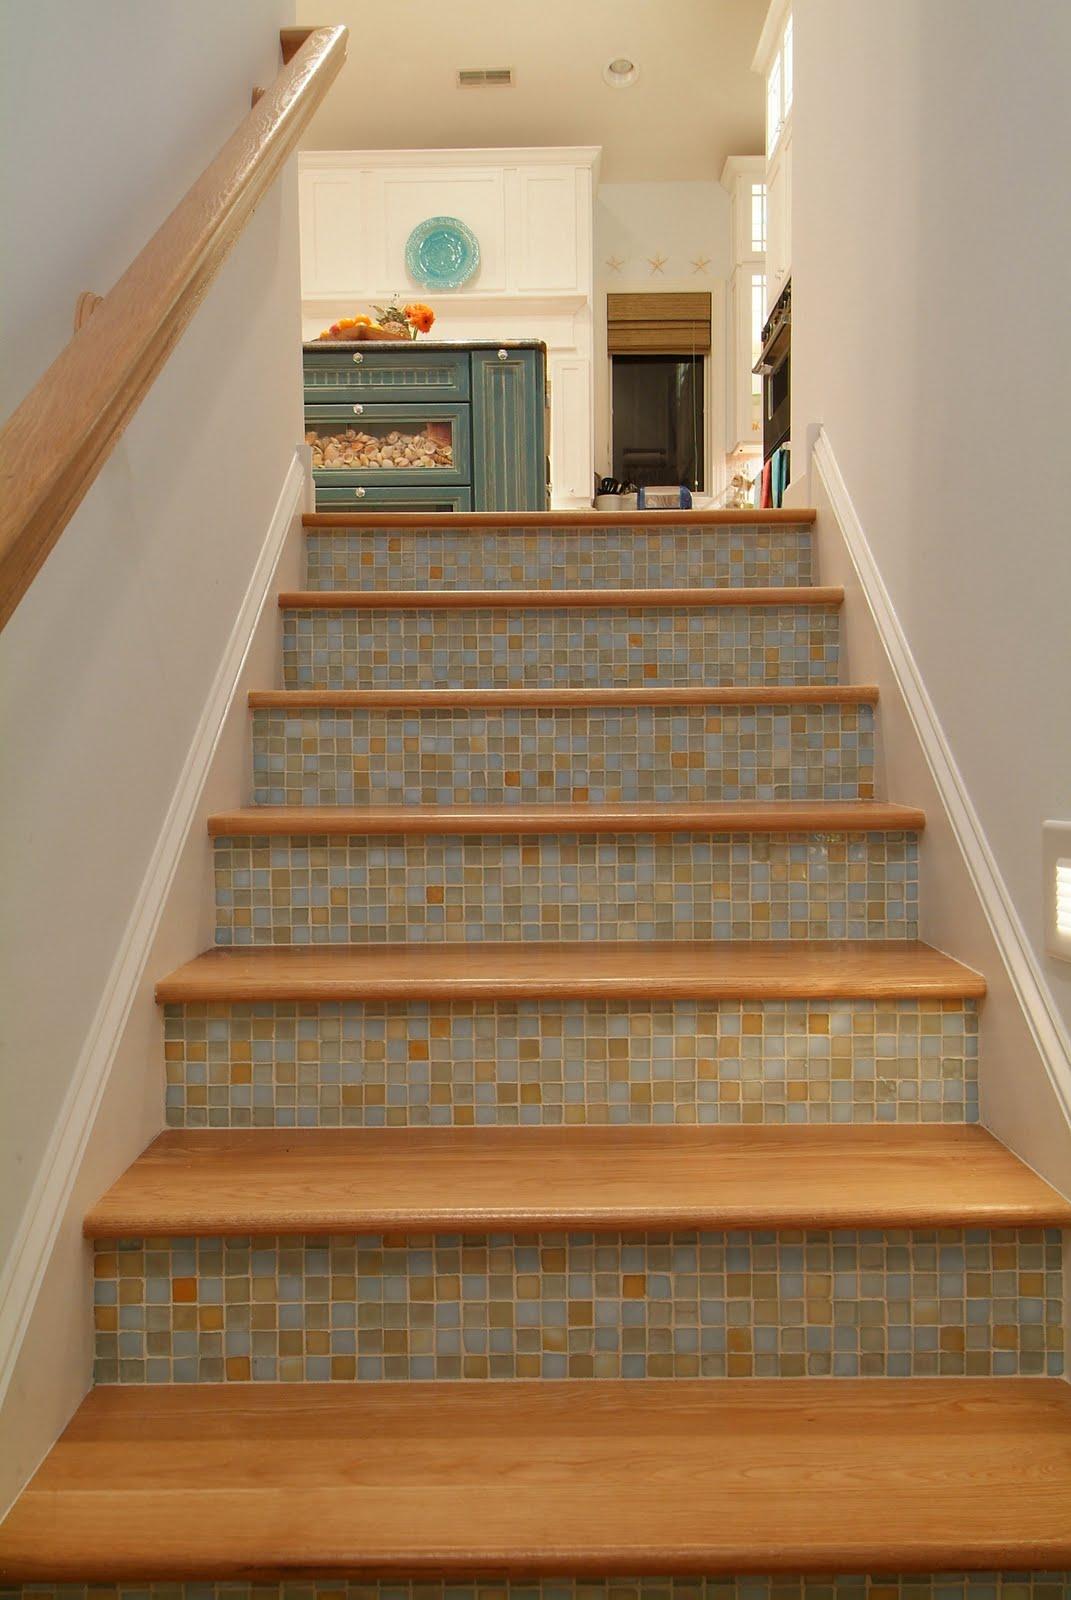 Lighting Basement Washroom Stairs: Low Tide High Style: Brooke Steuart